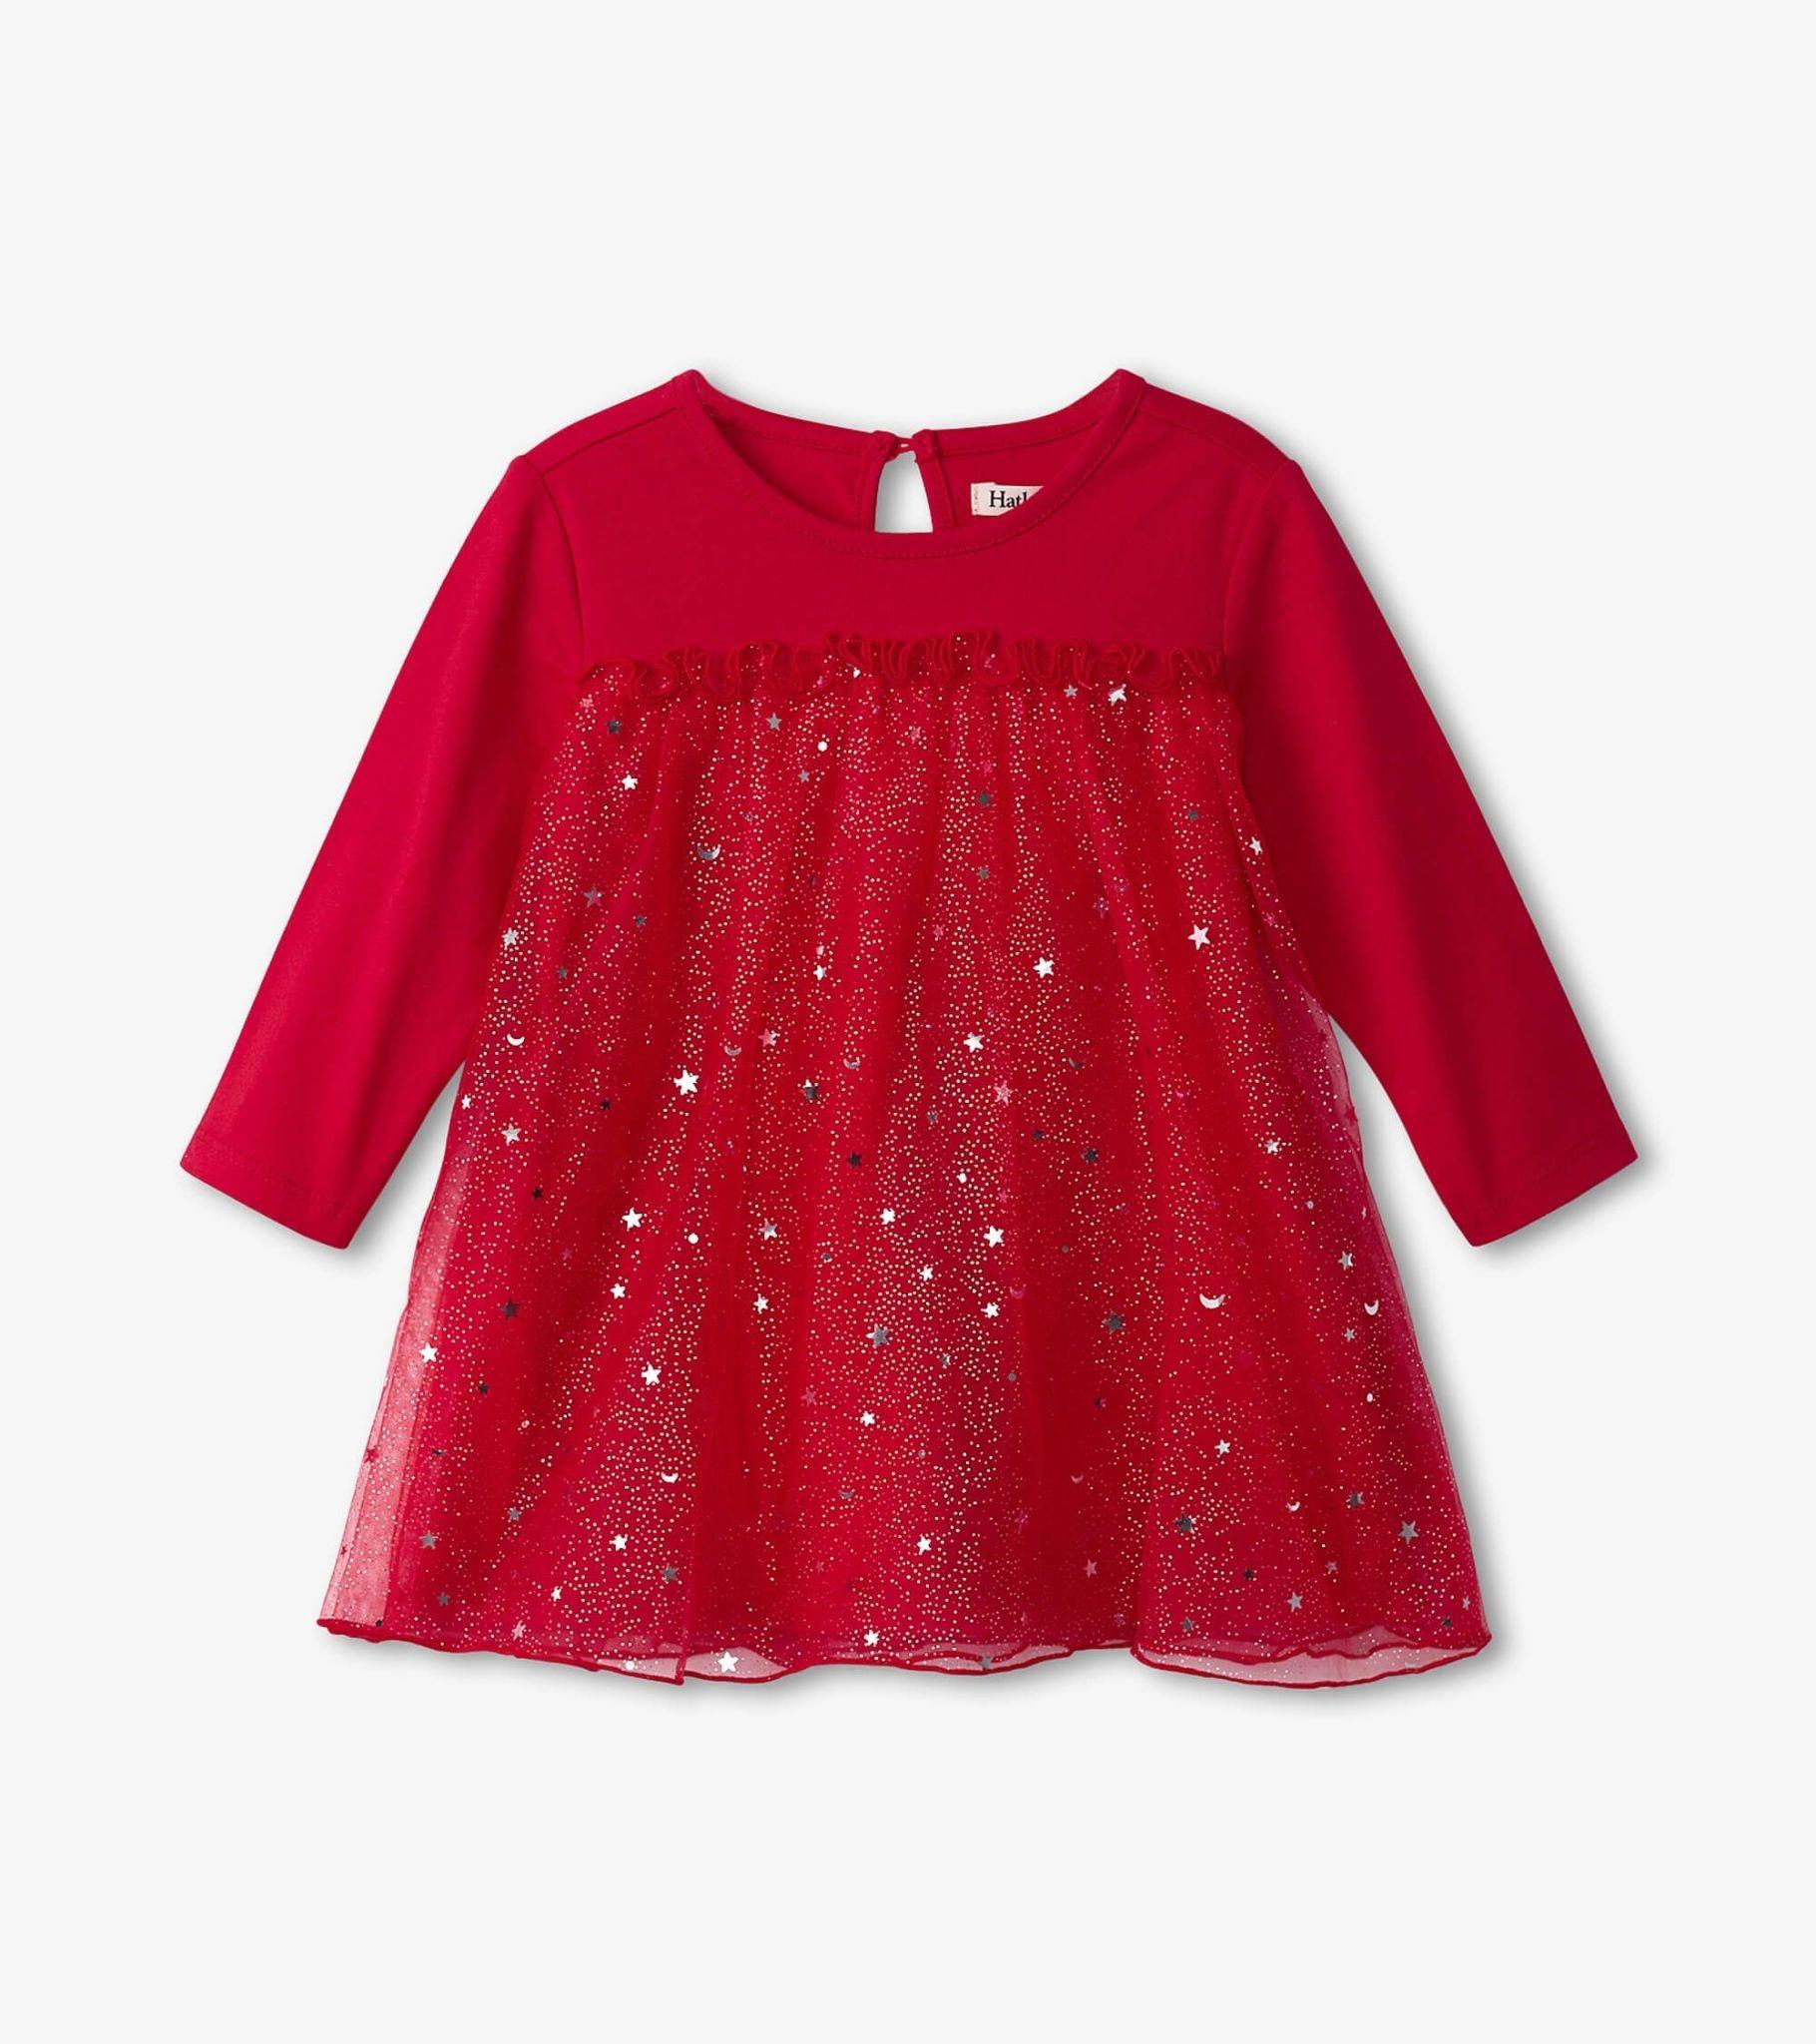 Hatley Hatley Twinkle Star Holiday Tulle Dress